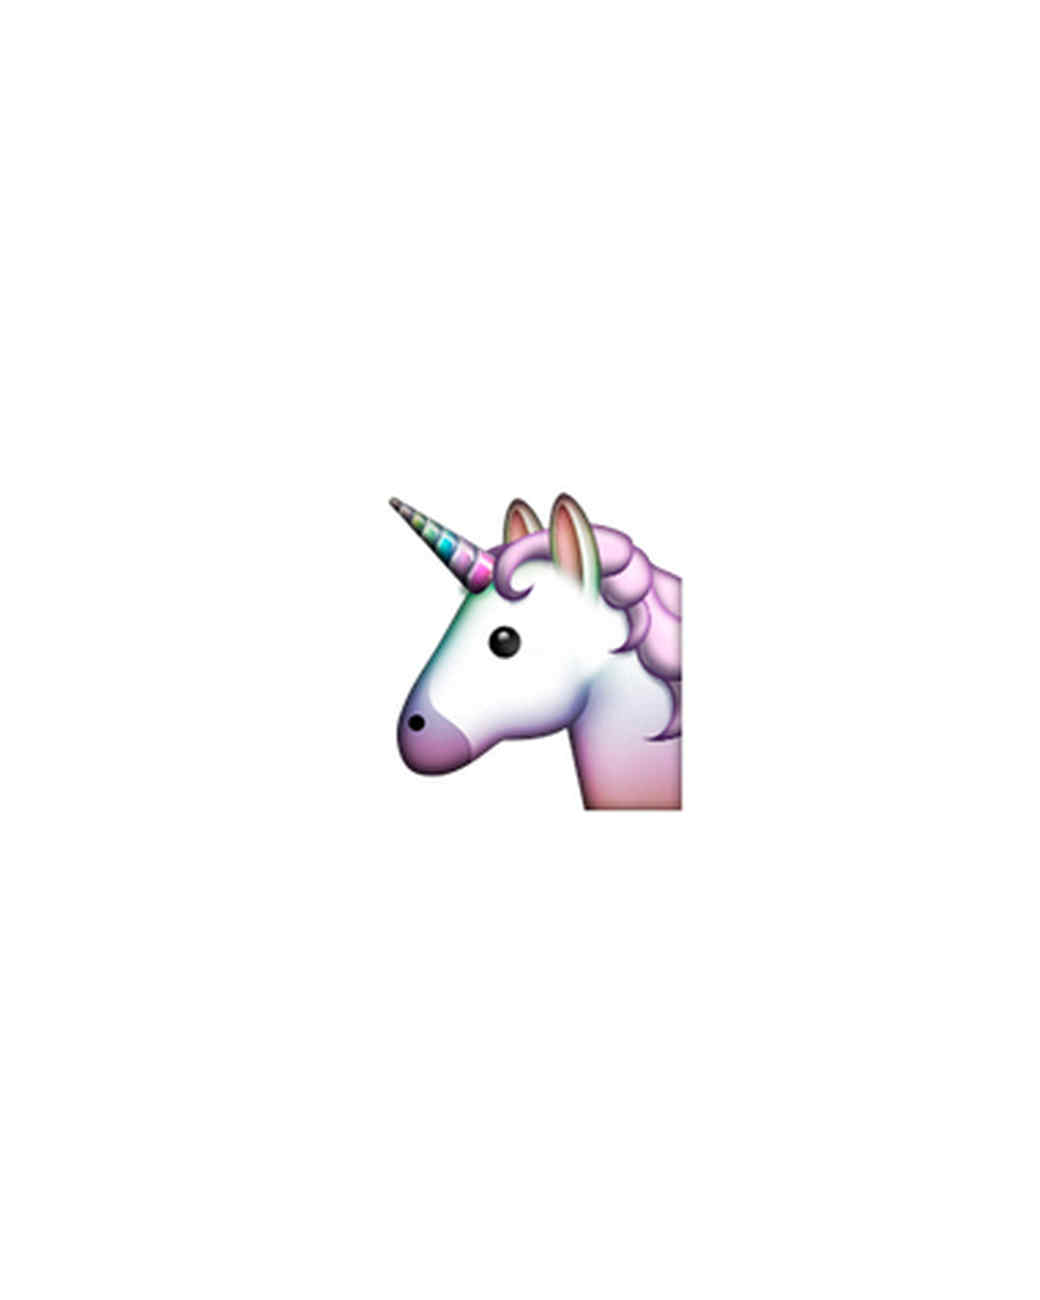 emoji-unicorn-1015.jpg